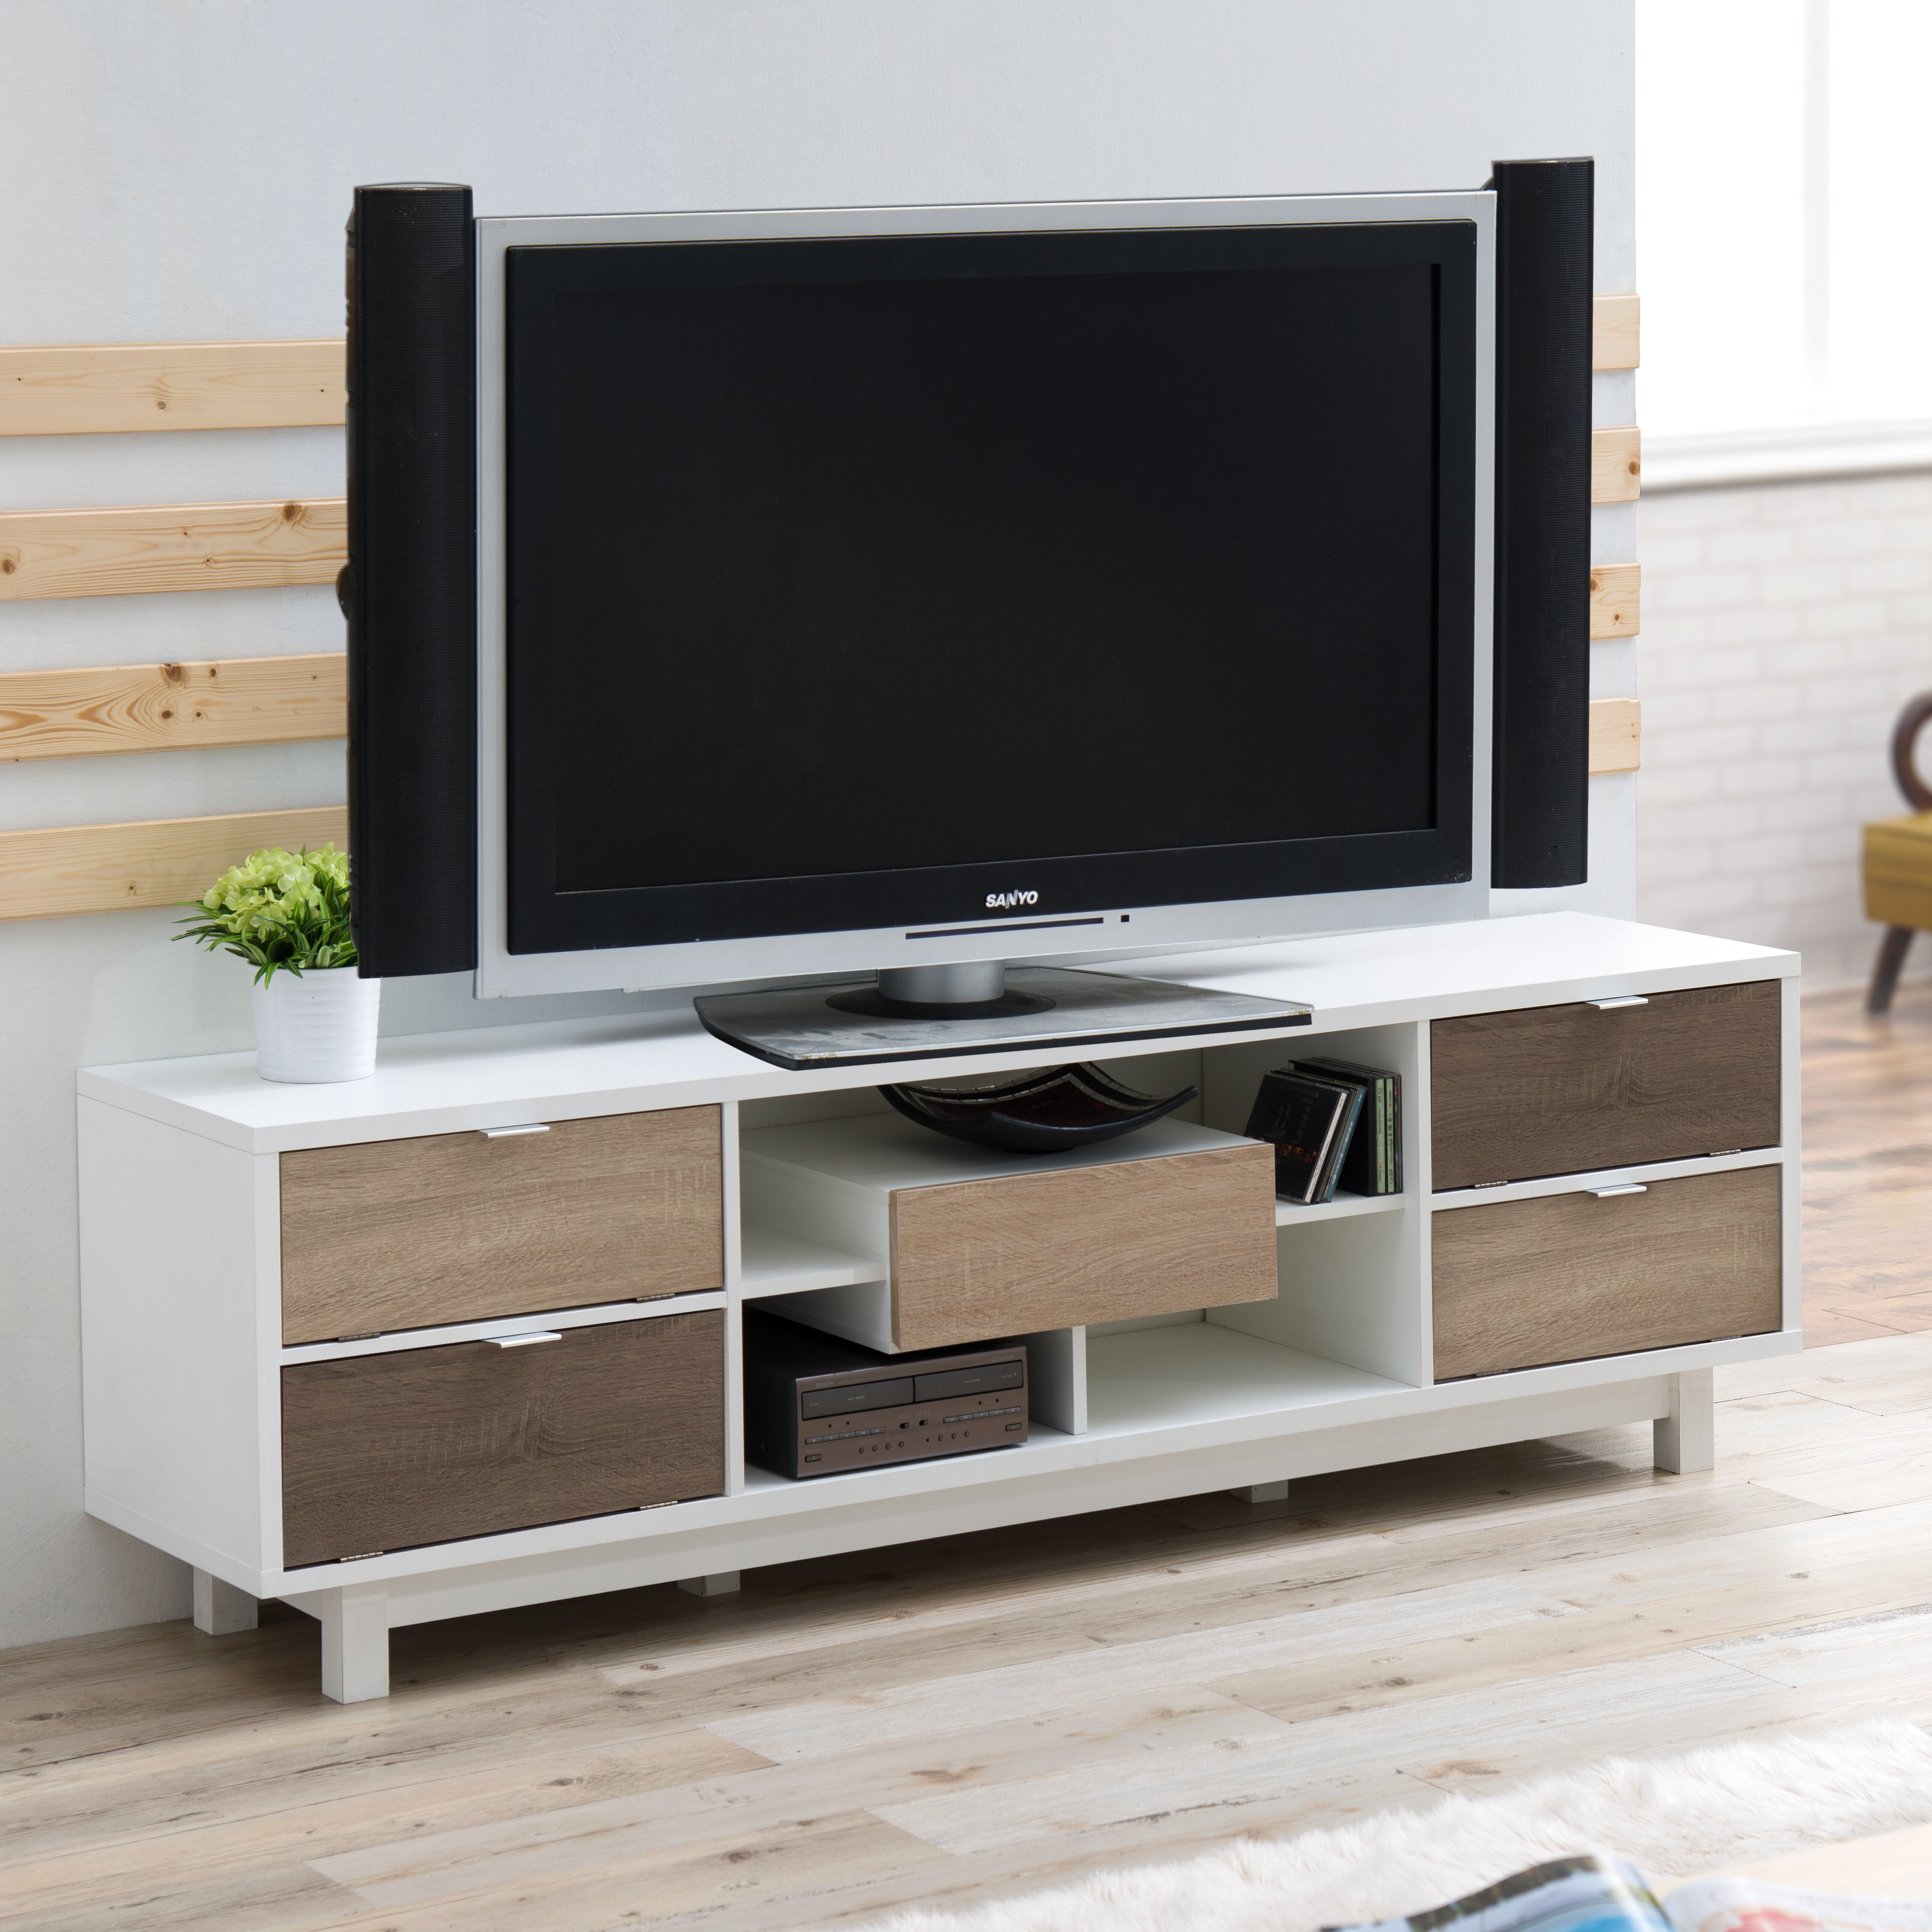 Hokku Designs Avada Tv Stand Reviews Wayfair